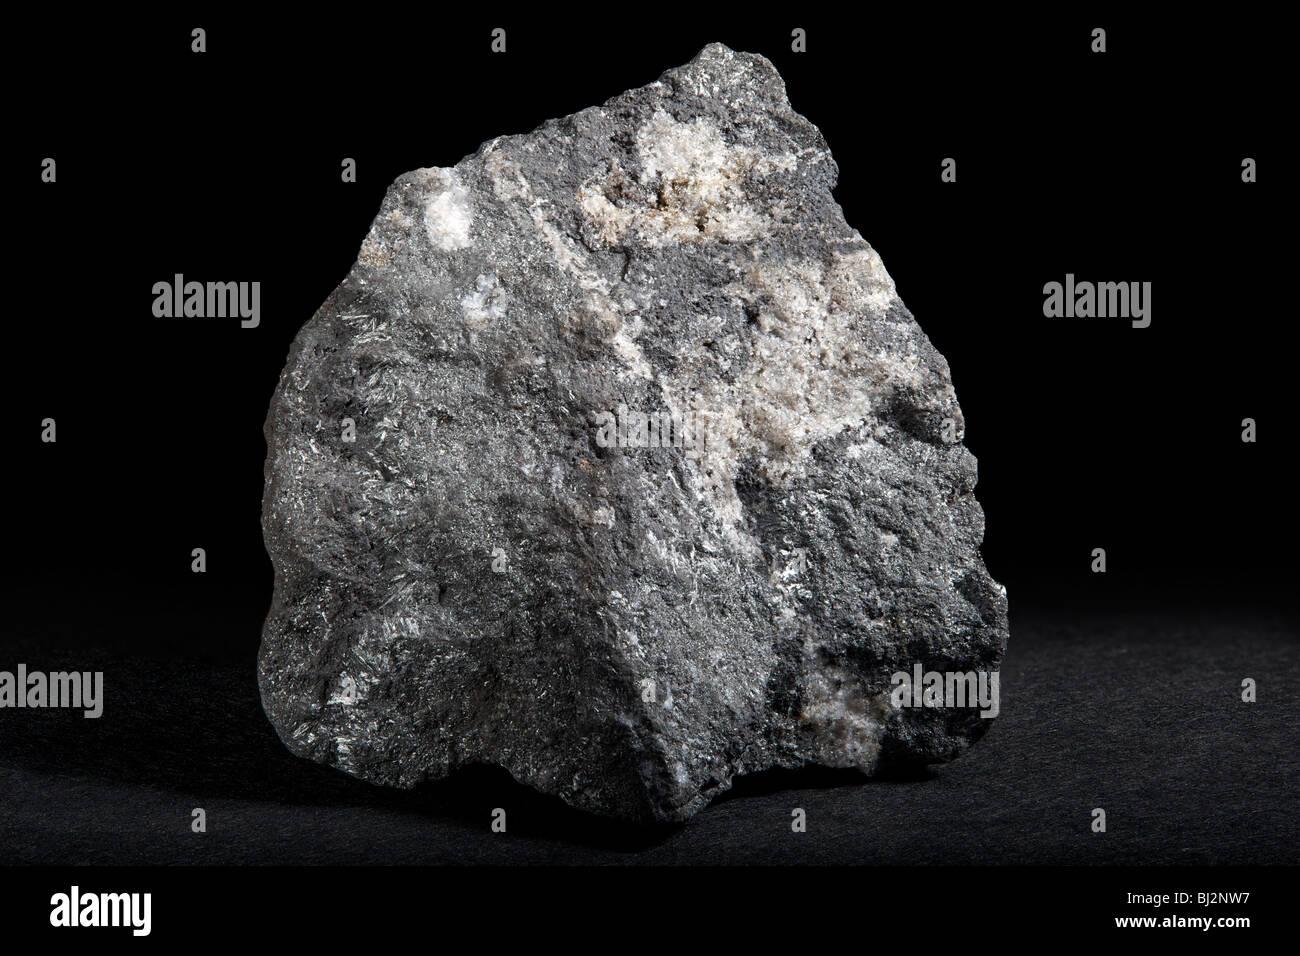 Pyrolusite (Manganese Ore) - Stock Image